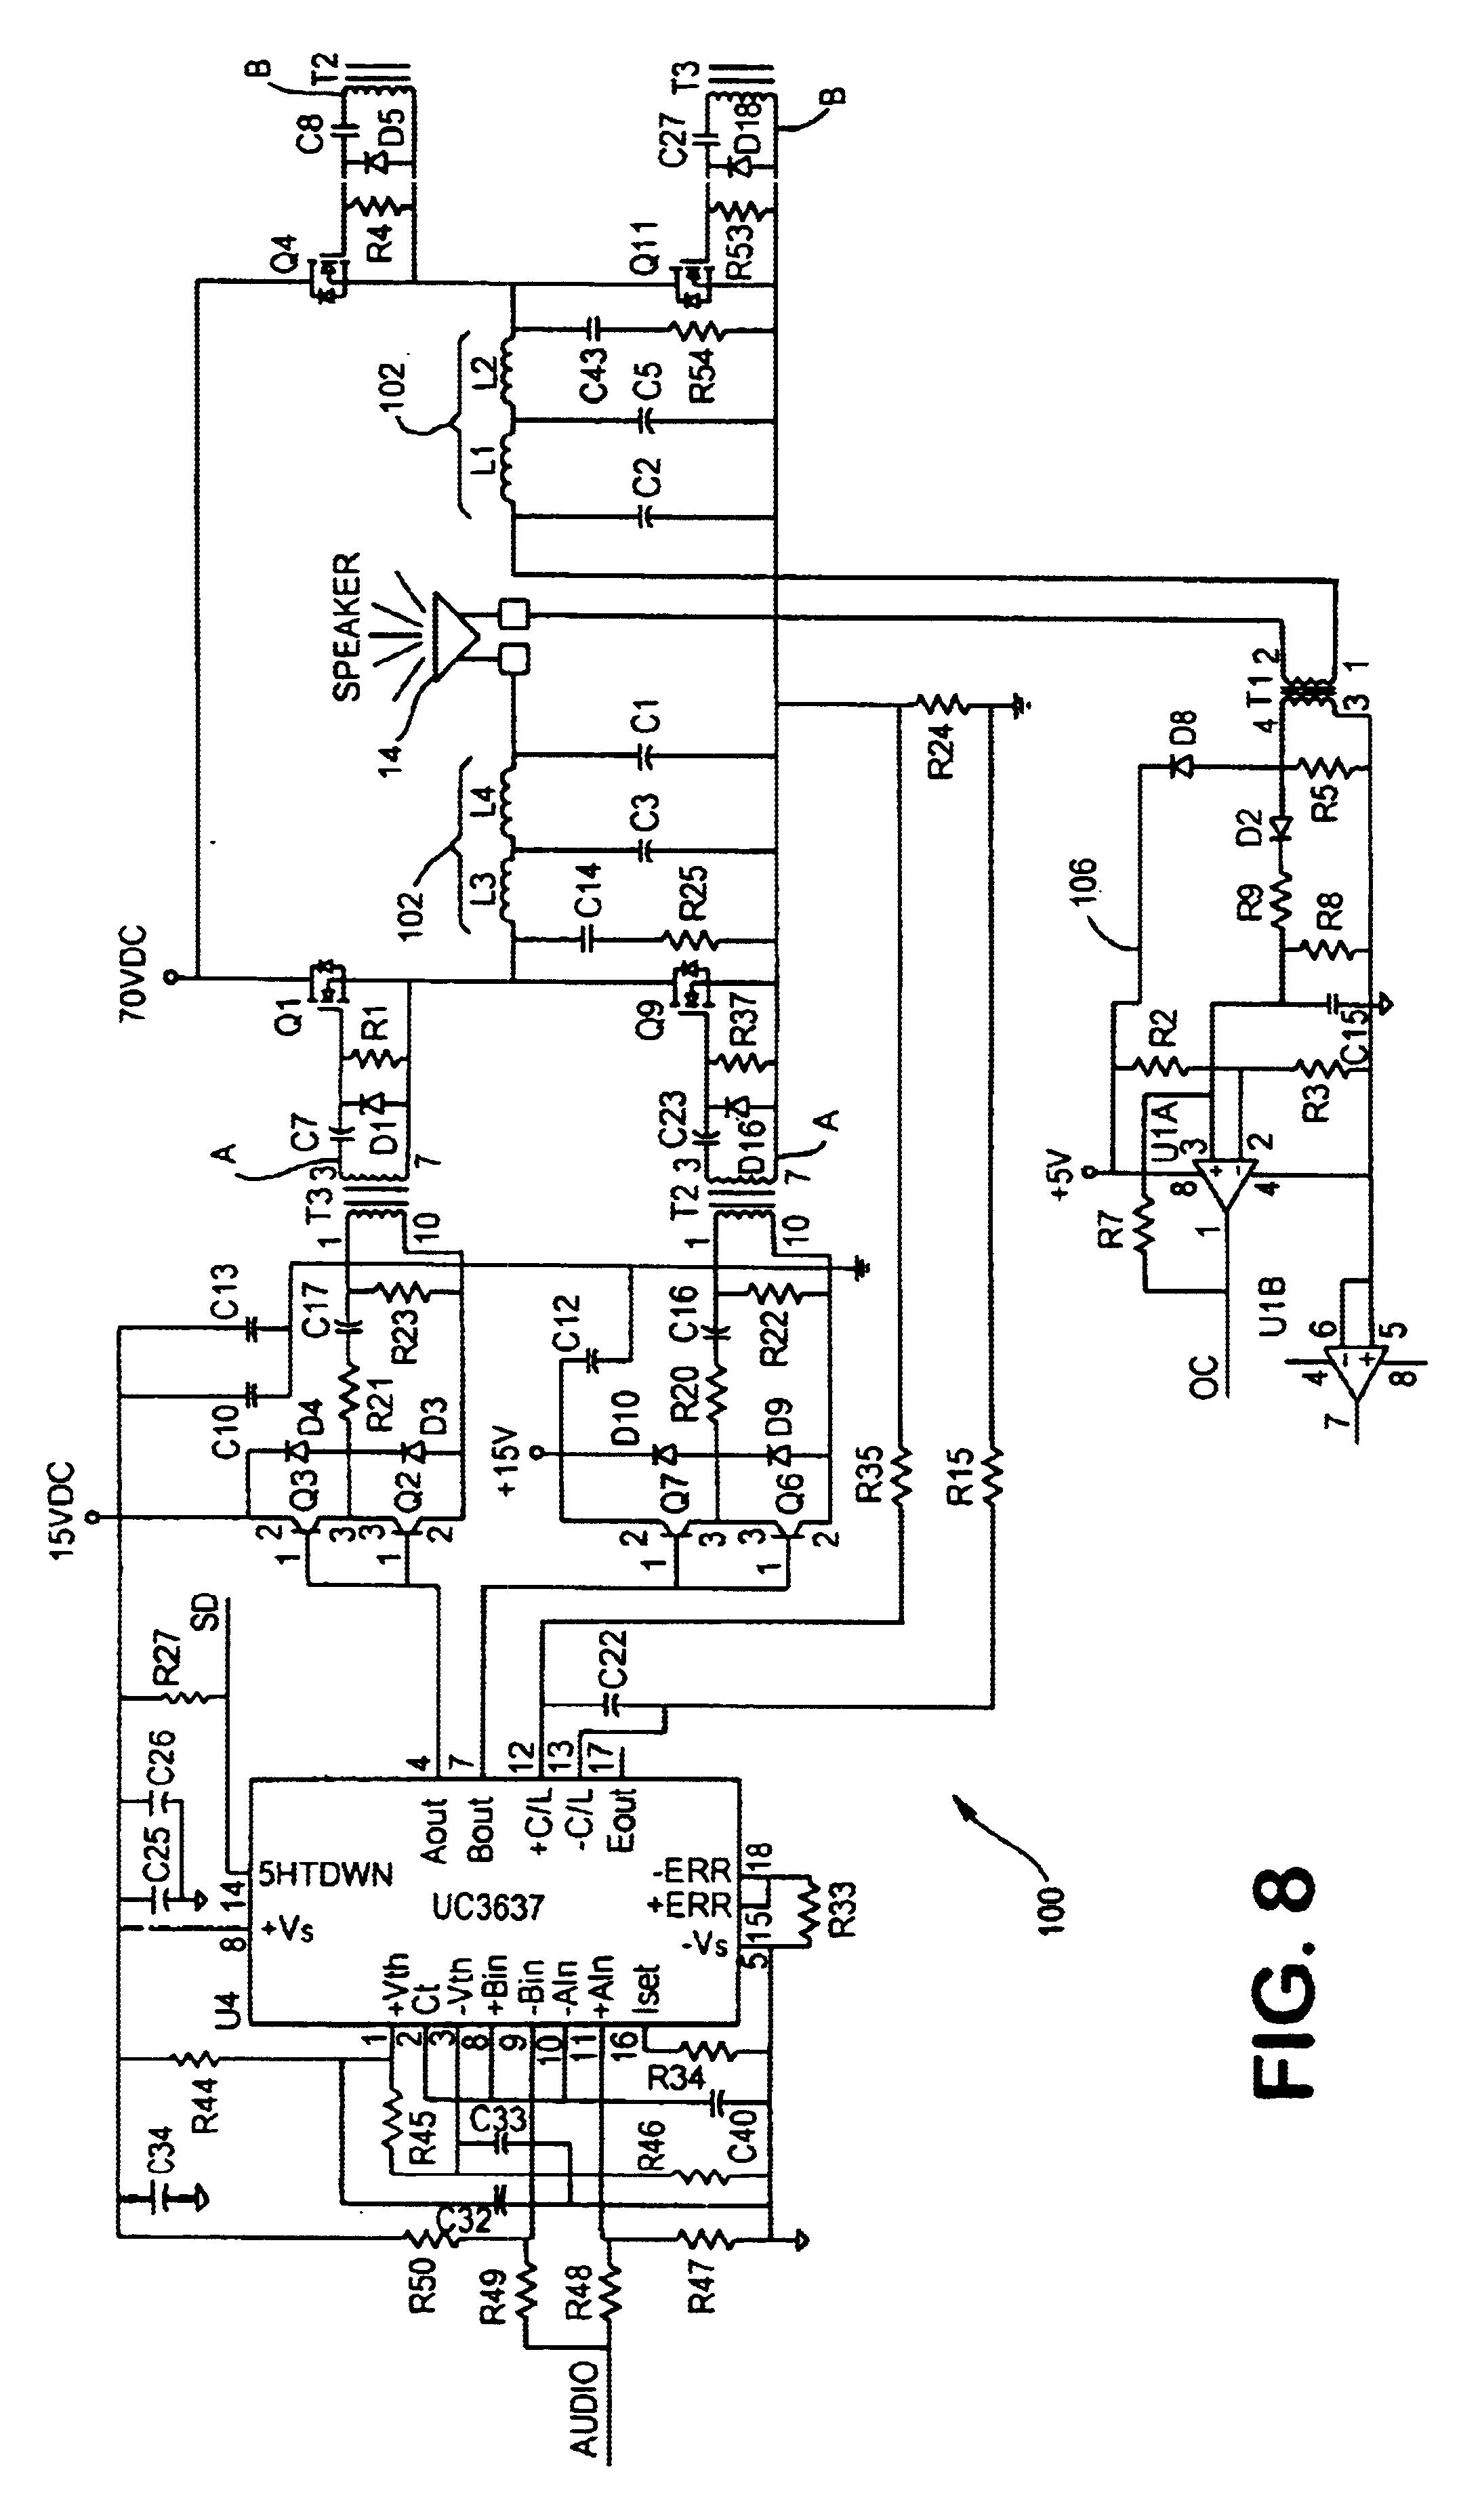 YZ_3075] Cessna 150 Electrical Wiring Diagram Additionally Cessna 152 Wiring  Wiring Diagram